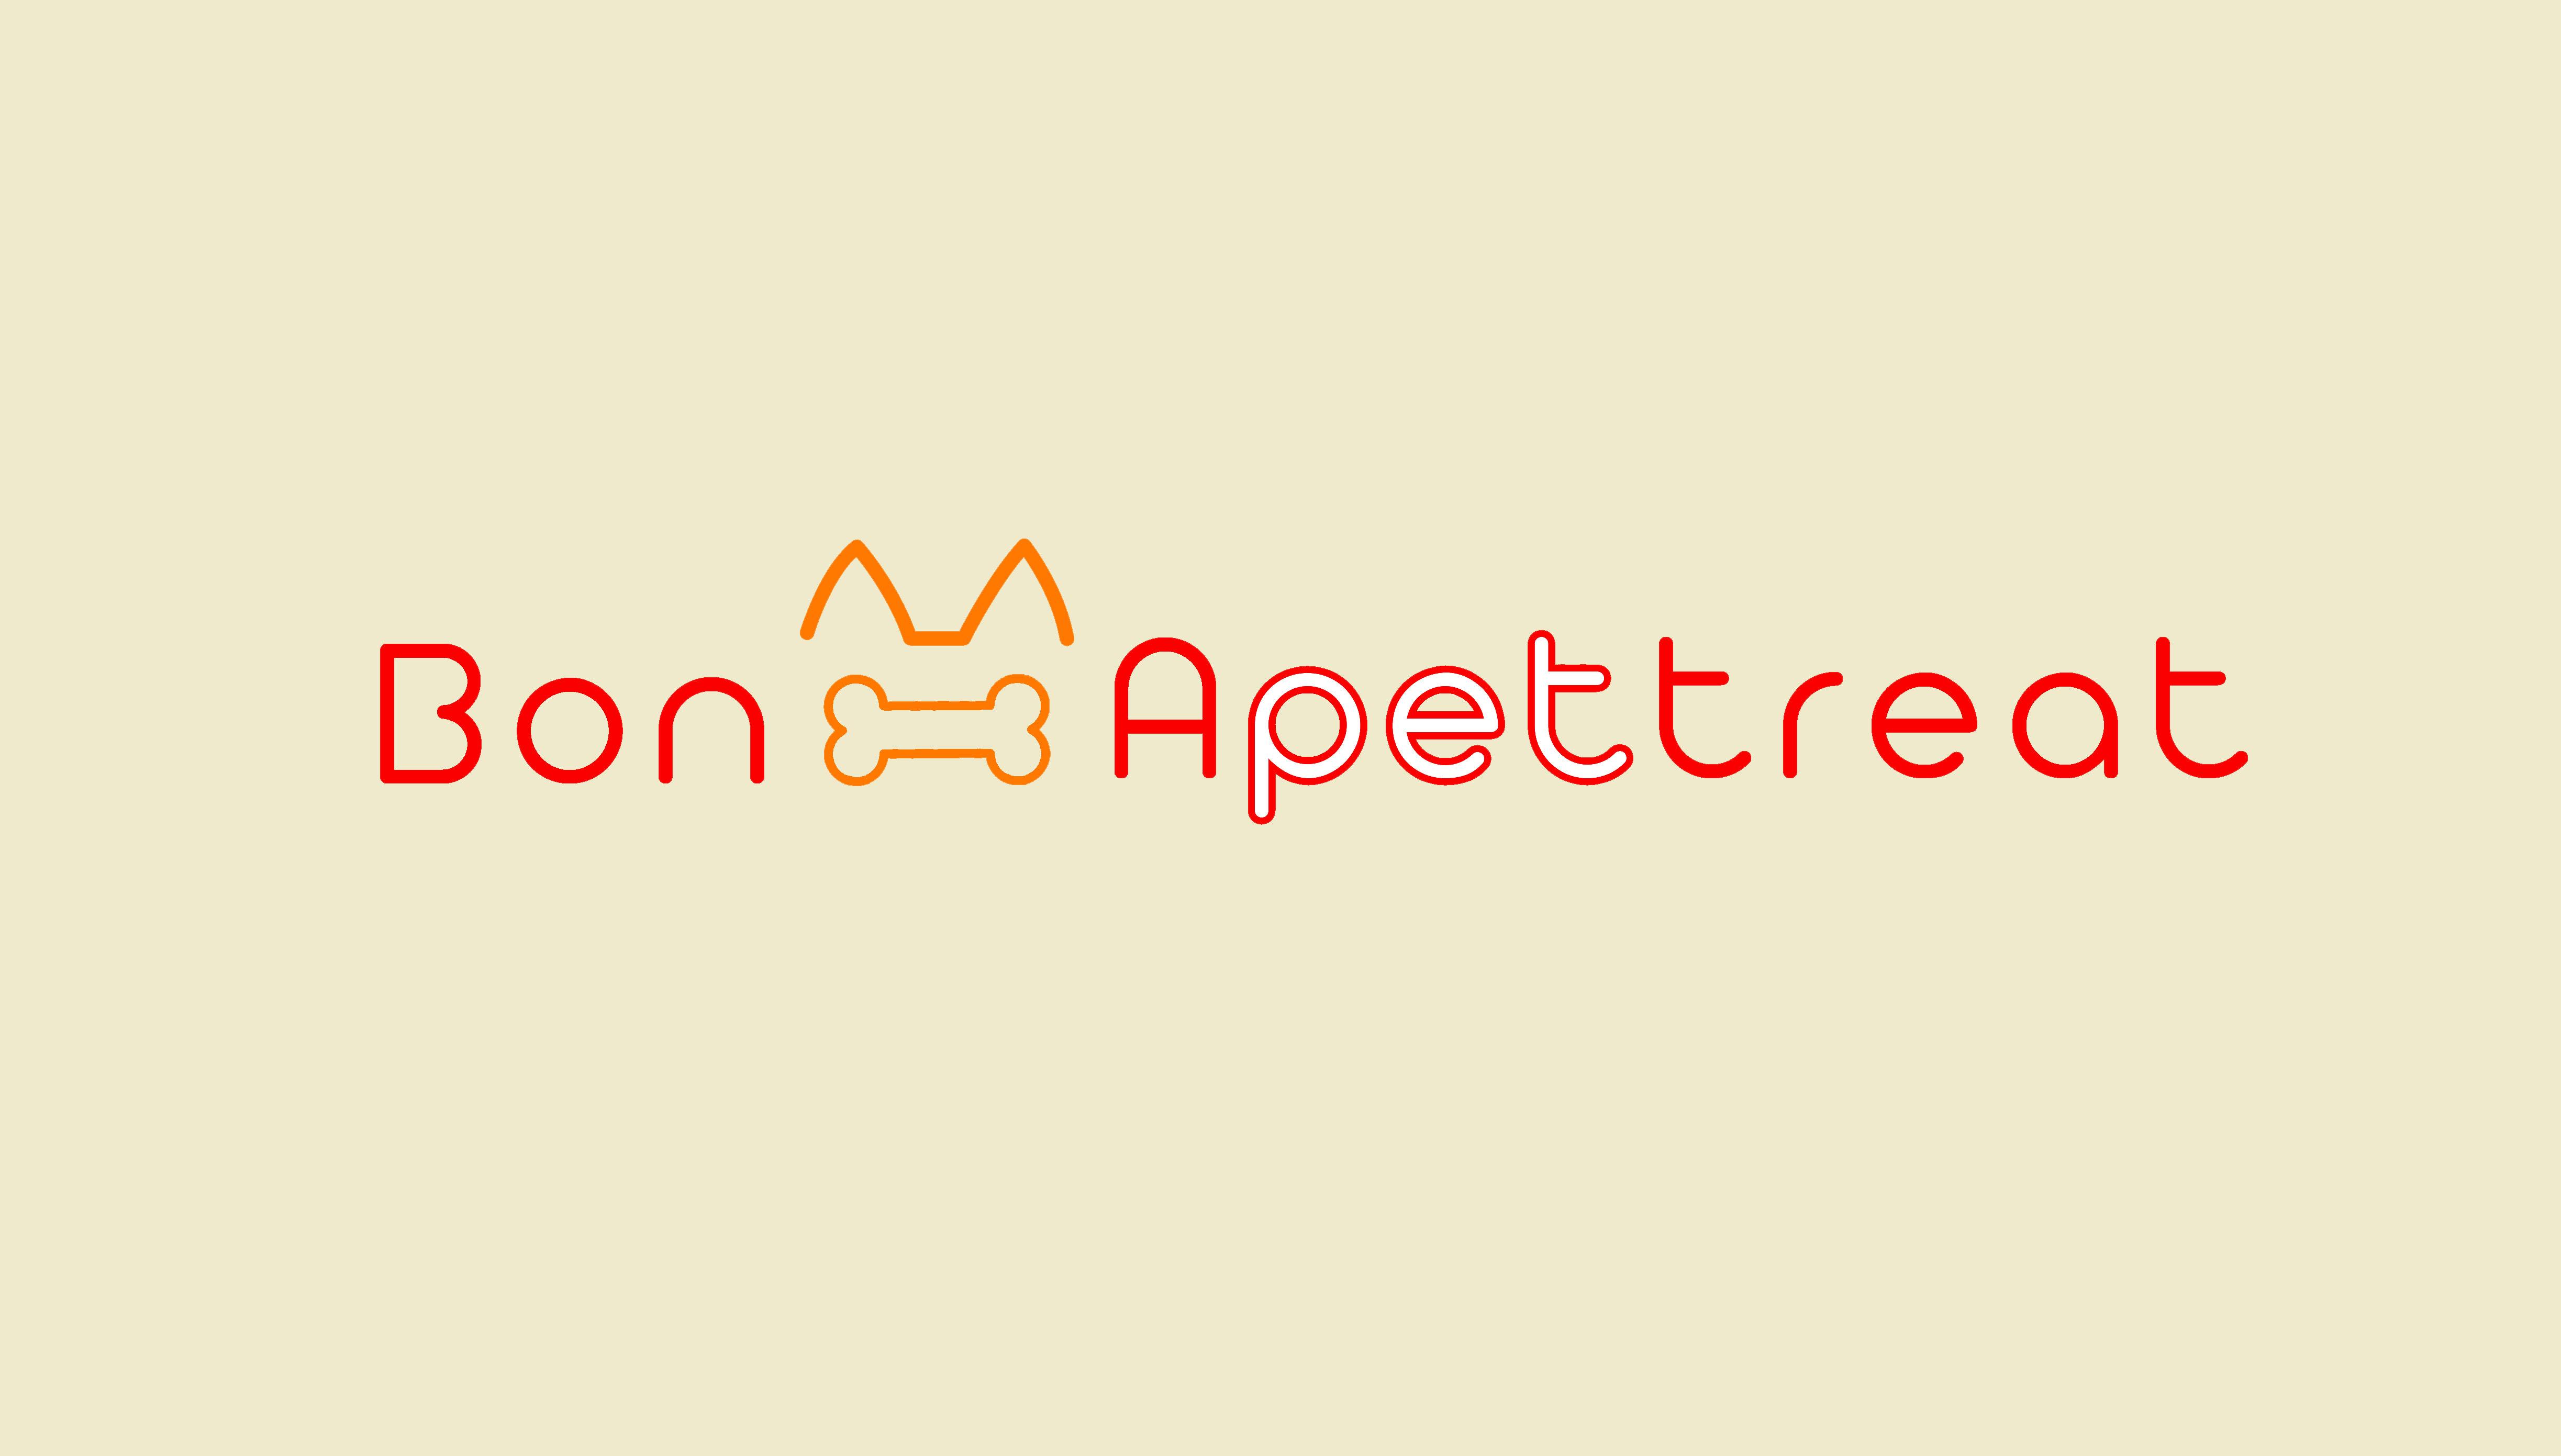 Bon-Apettreat